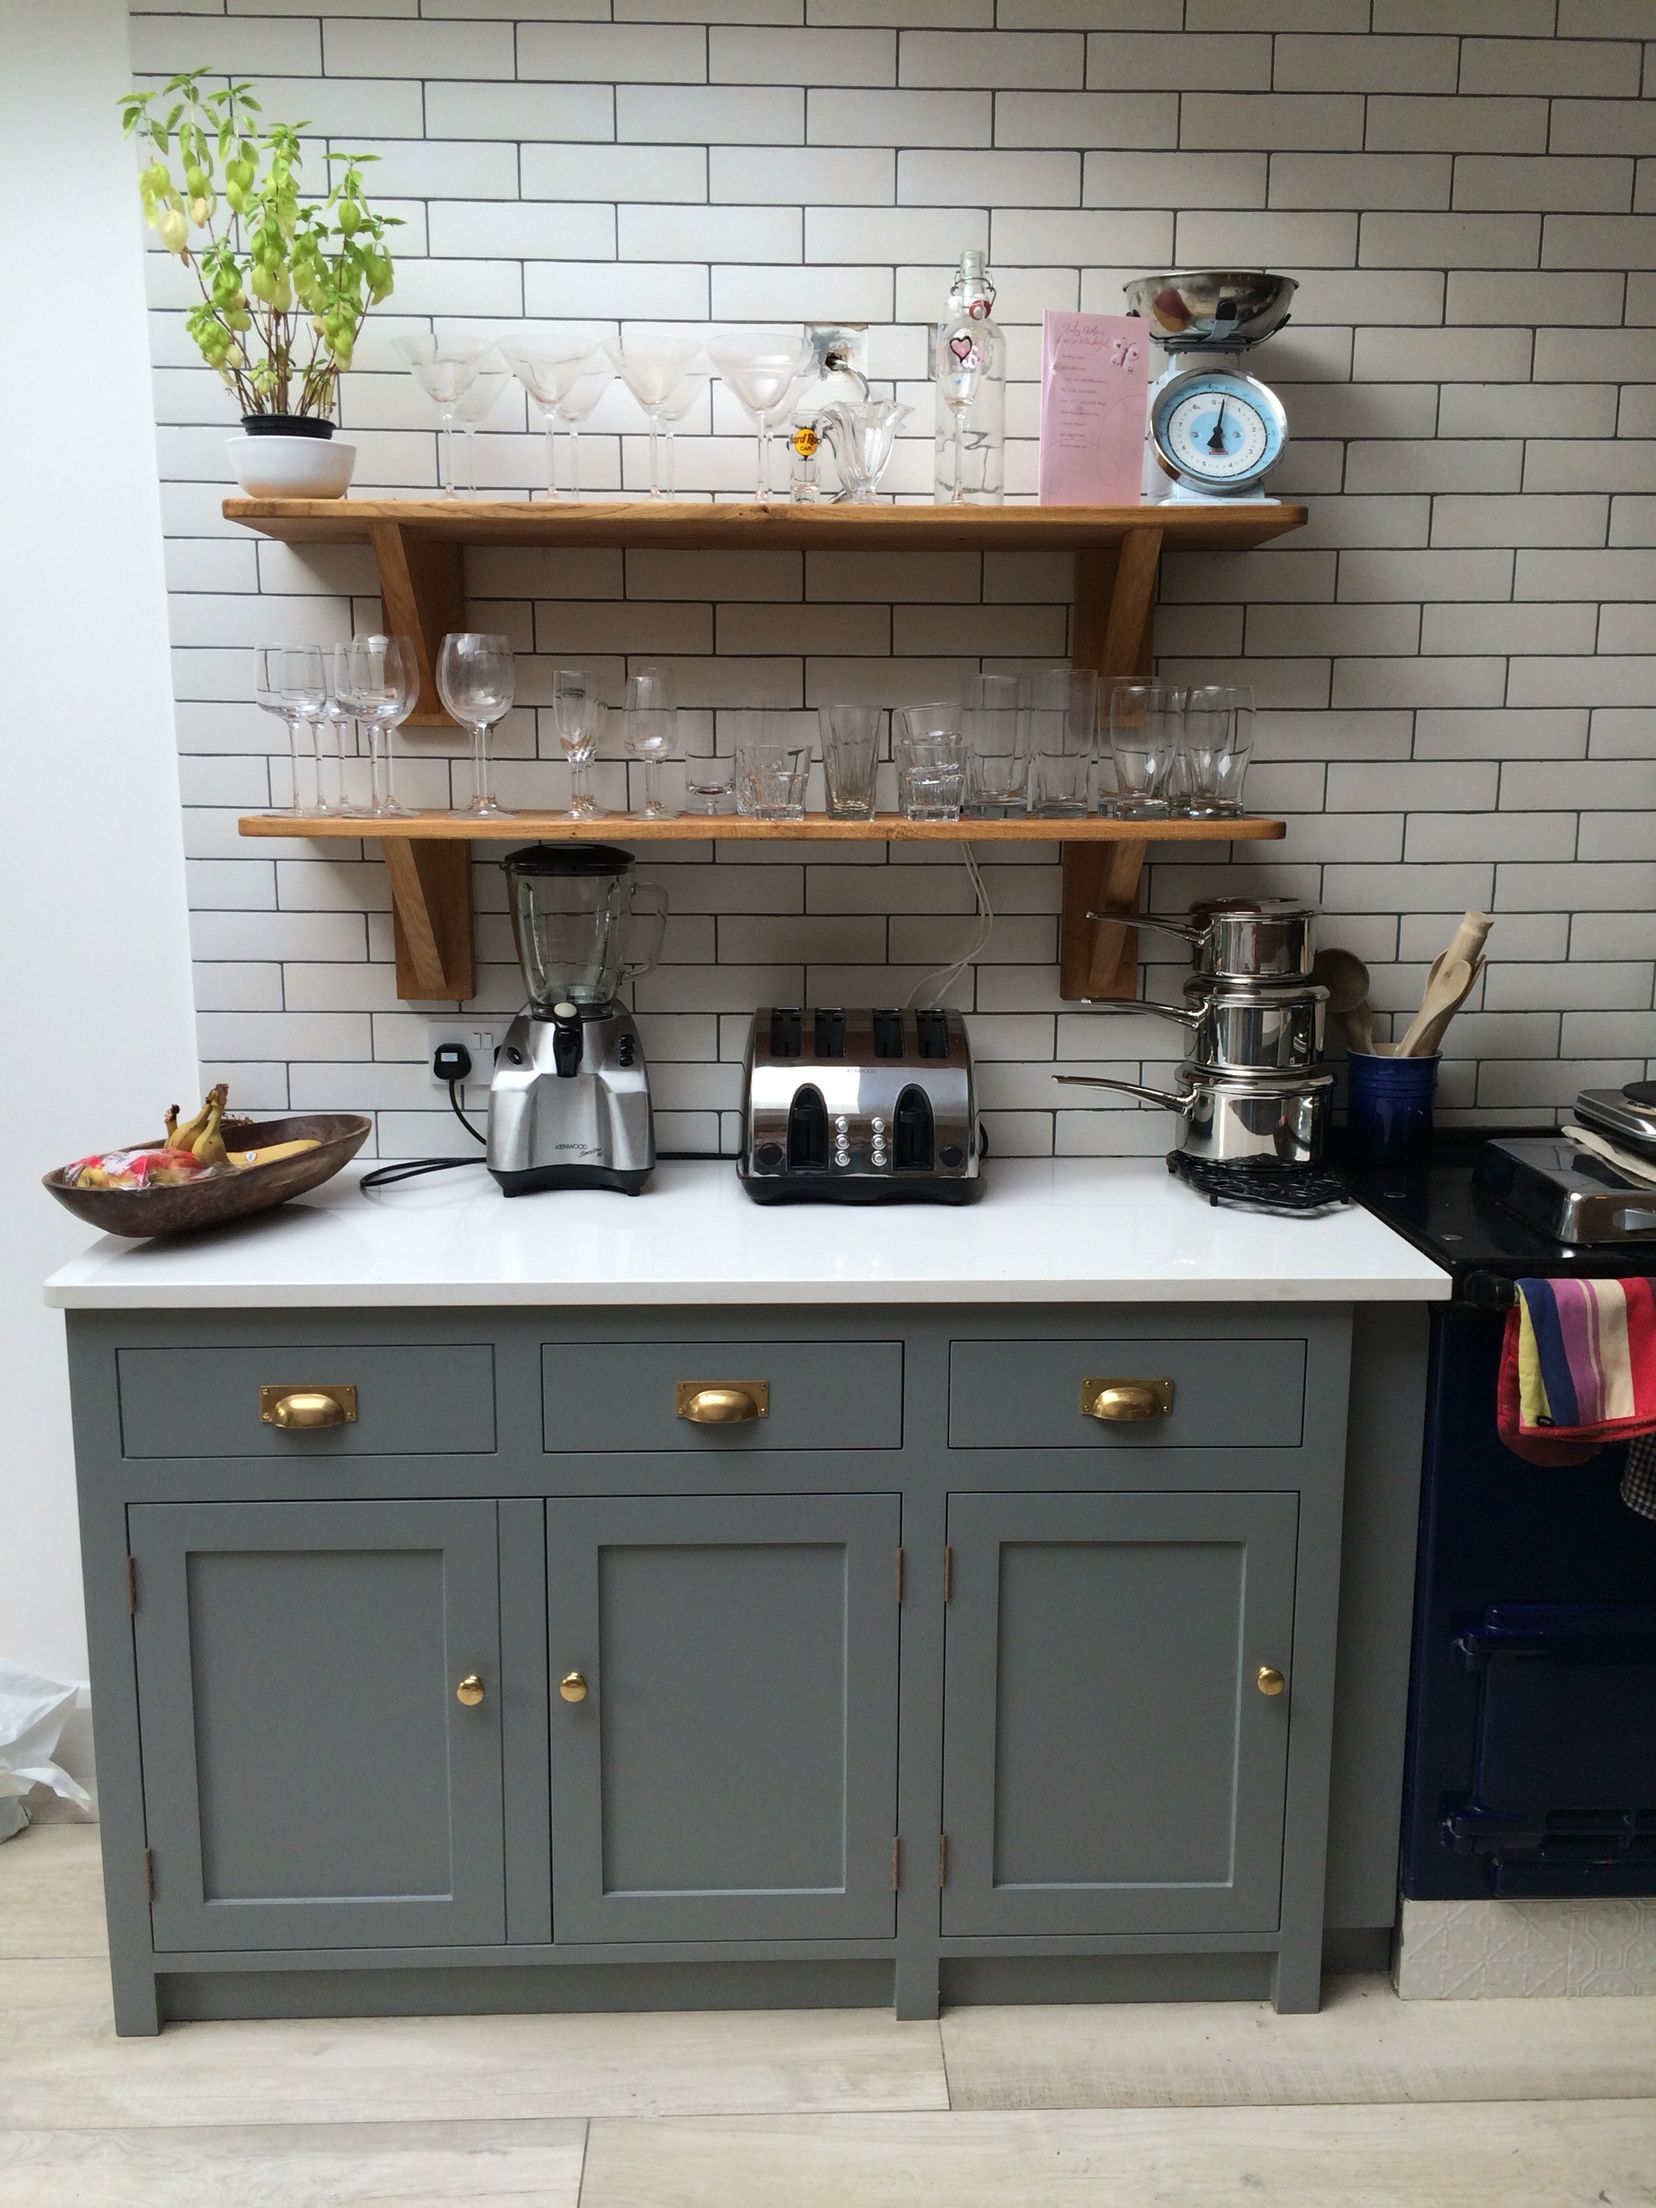 Handmade Bespoke Kitchens Hand Painted To Plummet Kitchen Inspiration Design Kitchen Cabinets Tiny House Kitchen